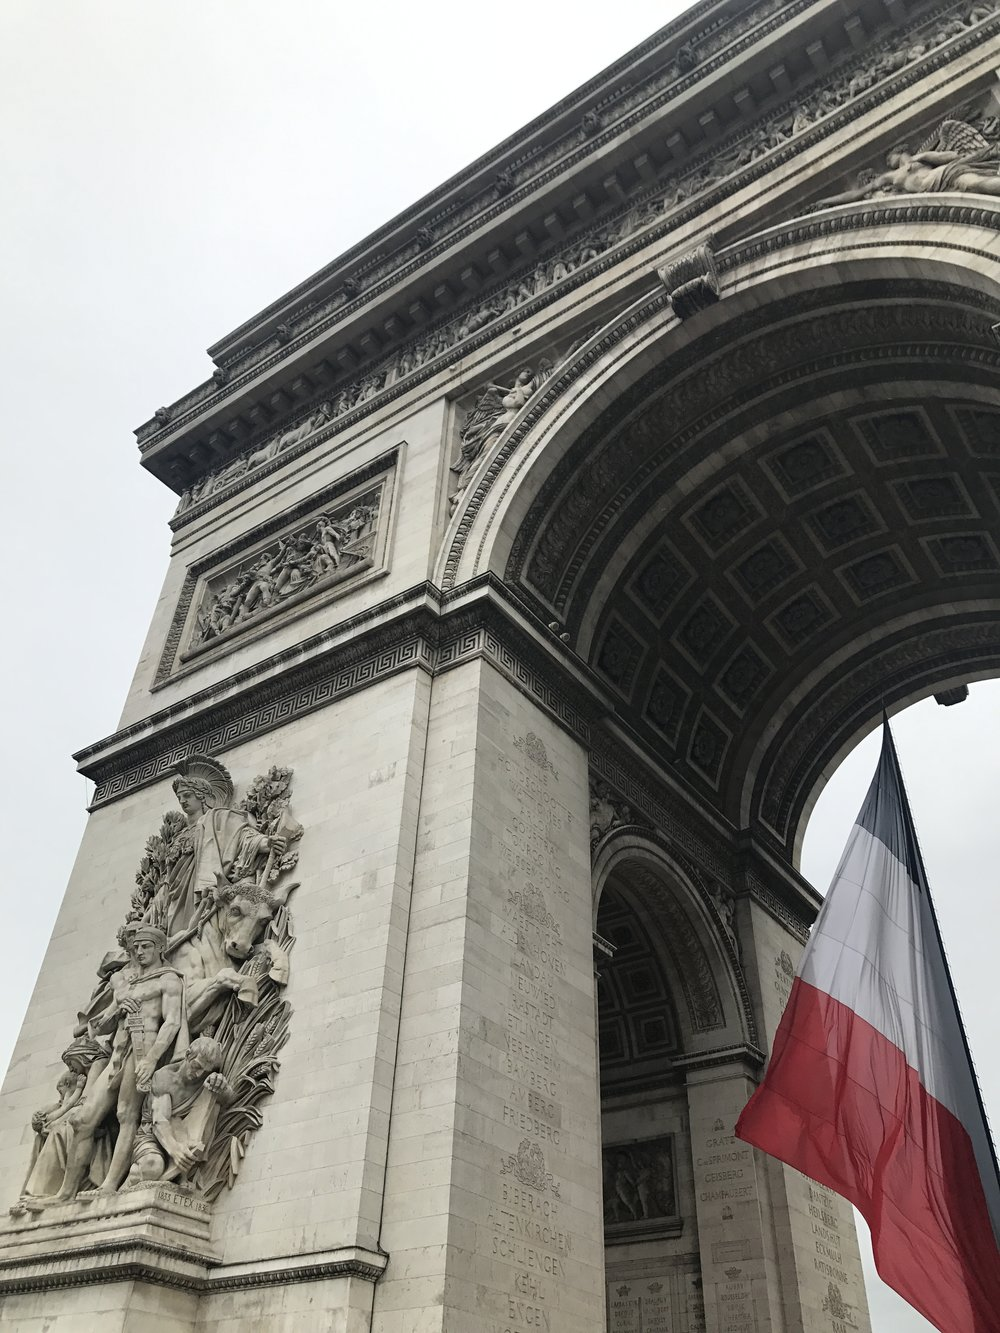 Arc de triomphem, Paris